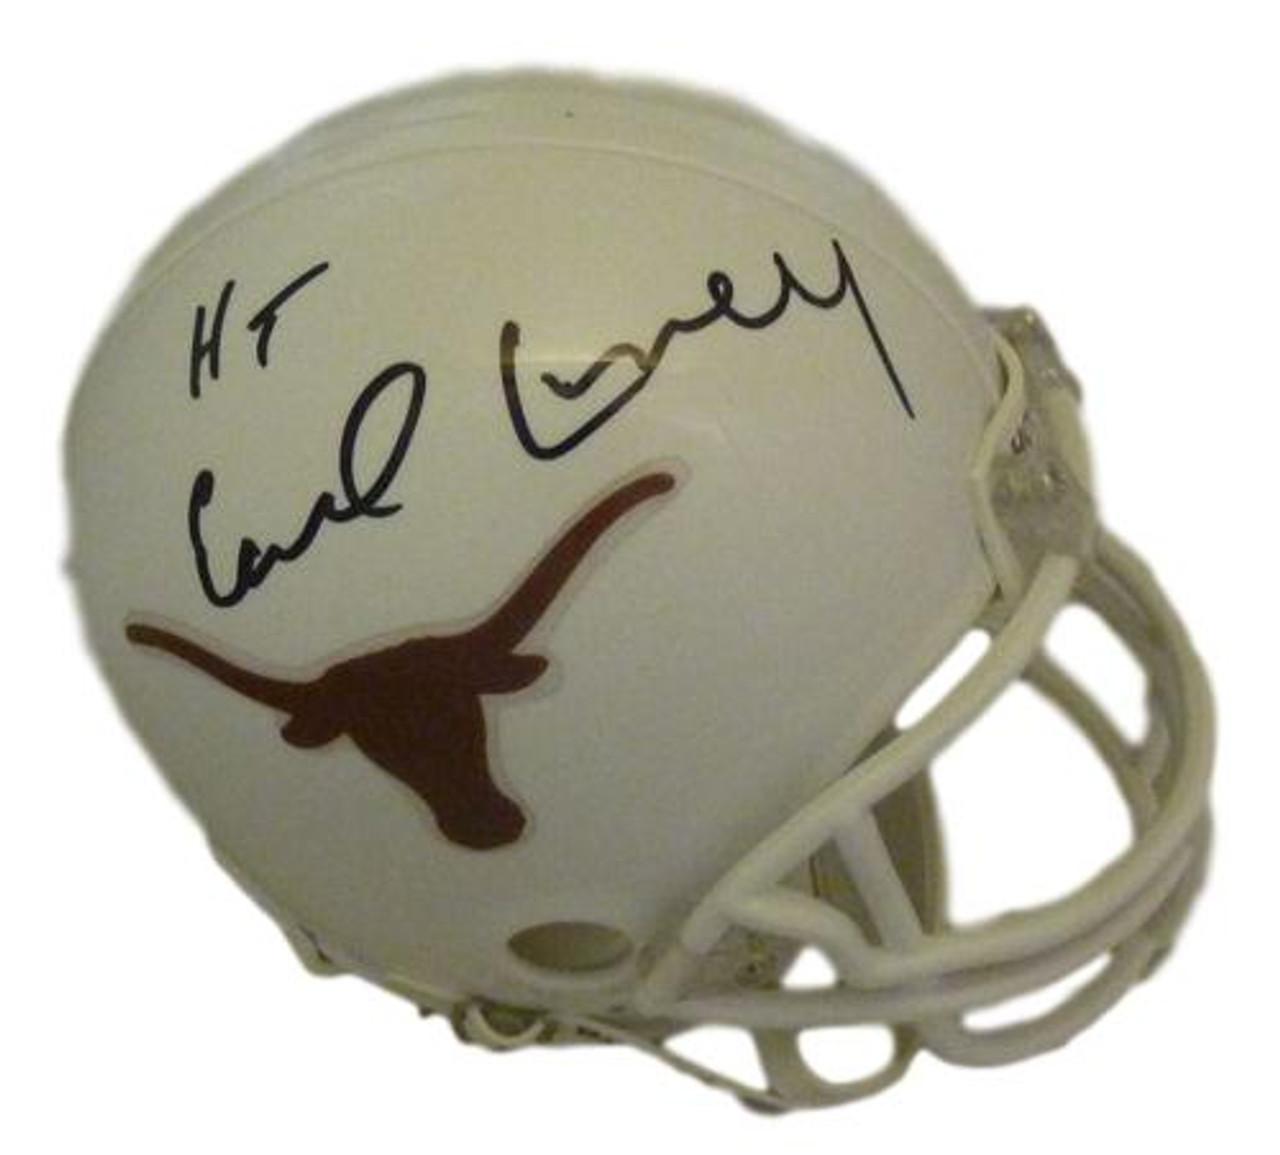 new product fa4d5 09667 Earl Campbell Autographed Texas Longhorns mini helmet w/HT 77 & JSA